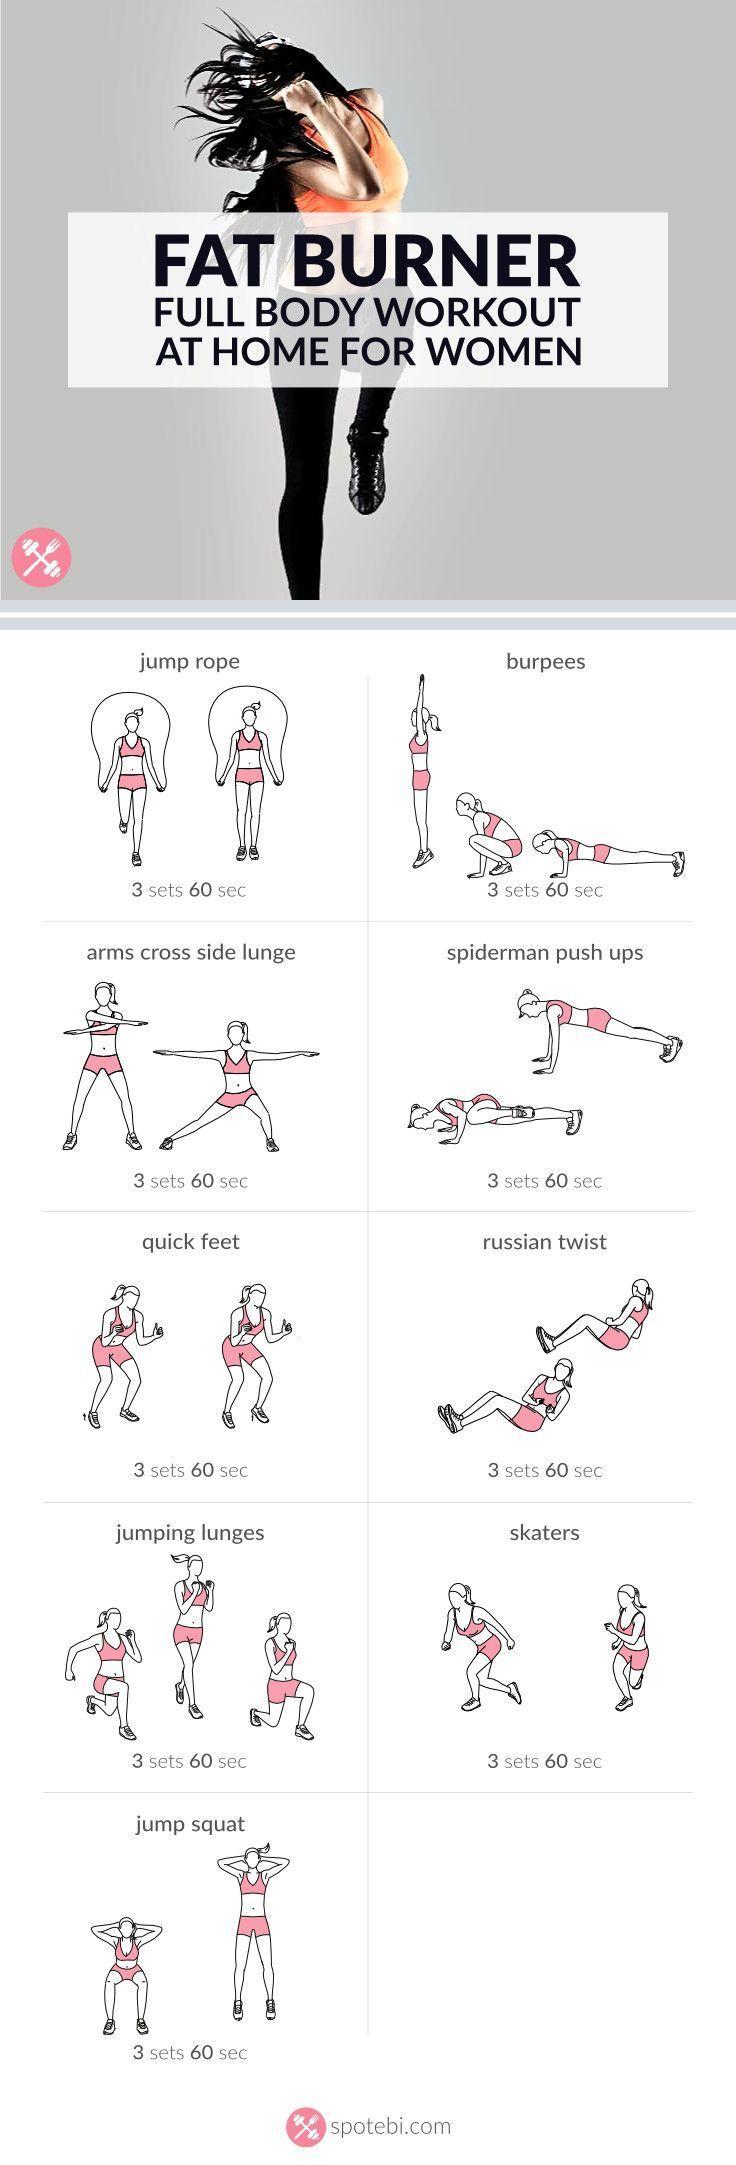 Slim down gain muscle photo 4